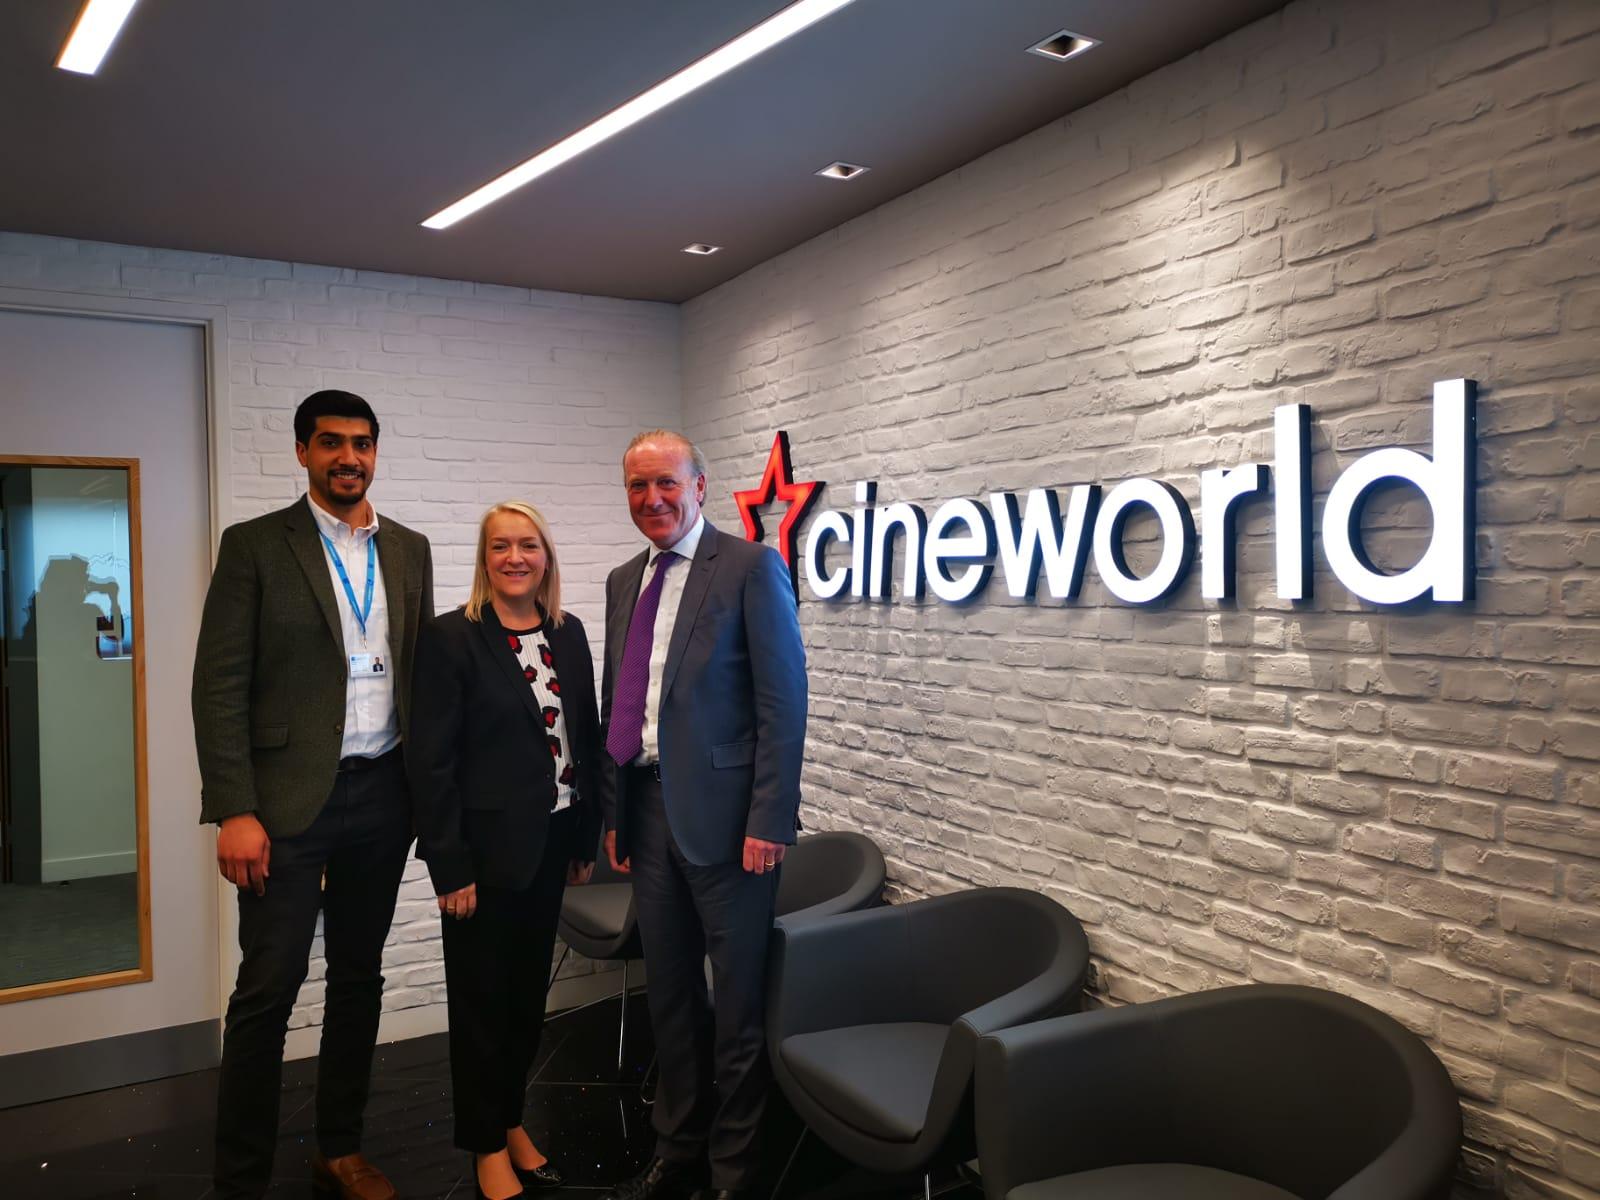 CINEWORLD AWARDS LODGE SECURITY NEW GUARDING CONTRACT